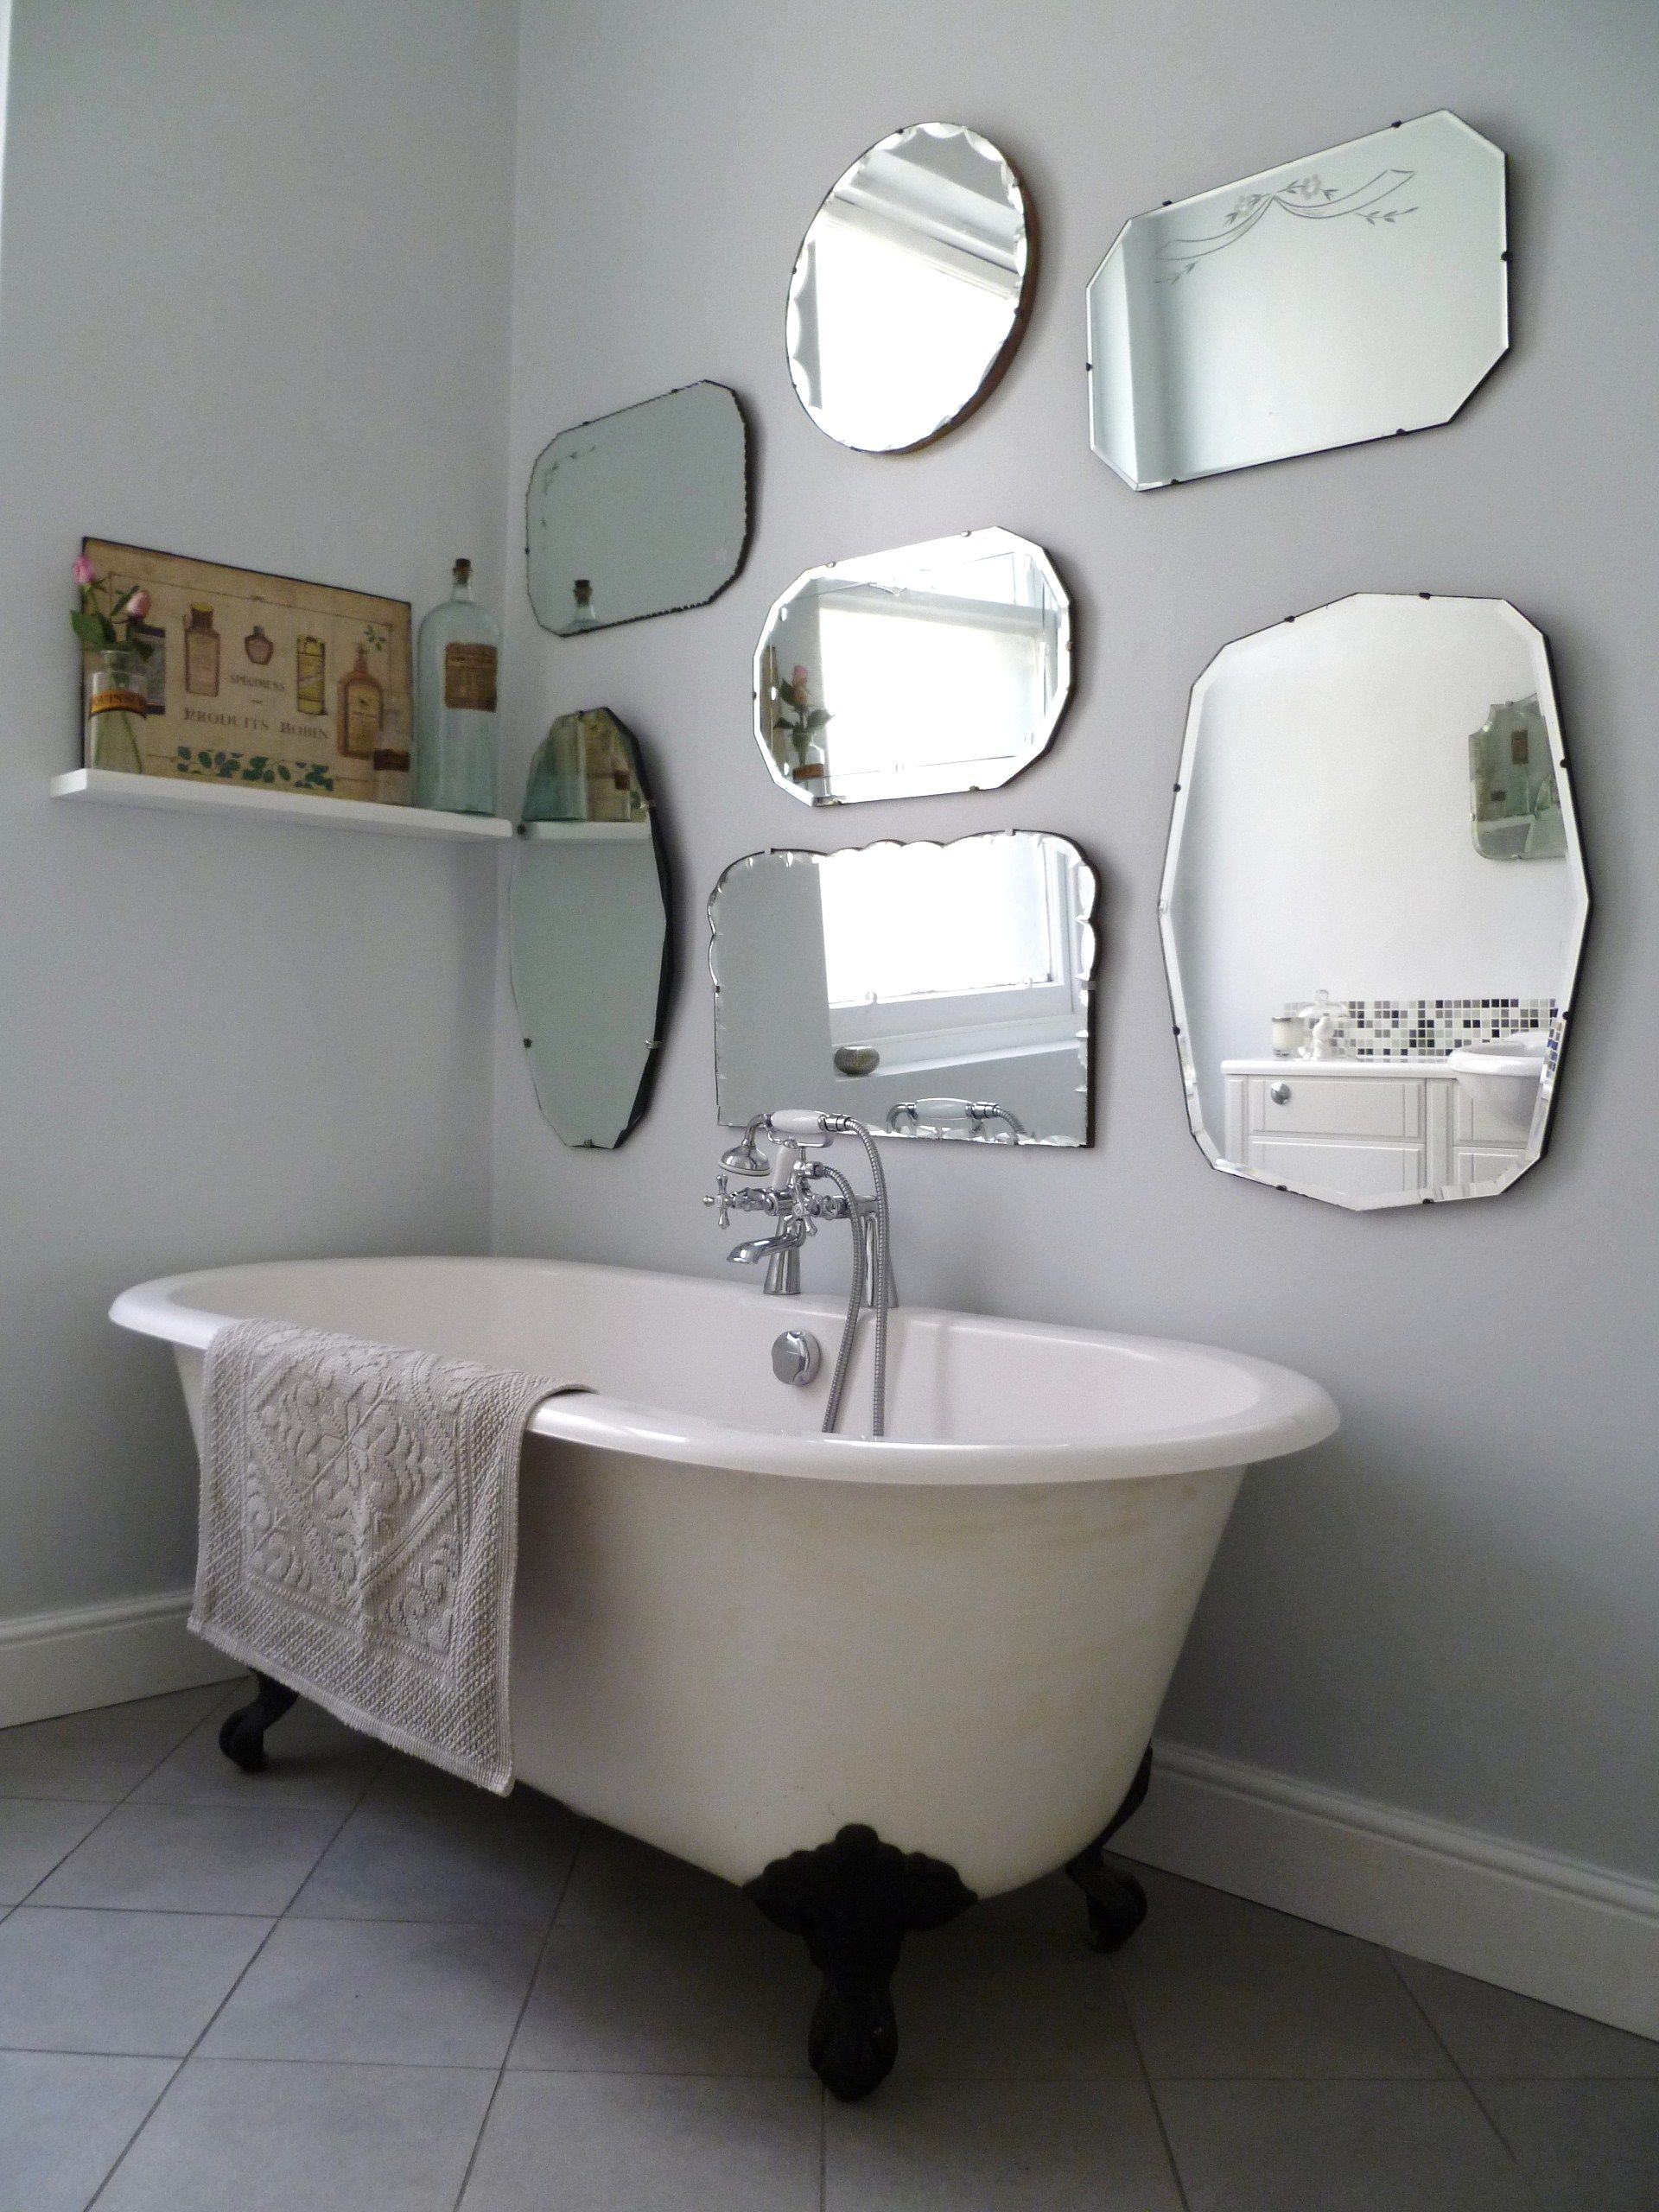 Bathroom Mirror Ideas Diy For A Small Bathroom Bathroom Mirror